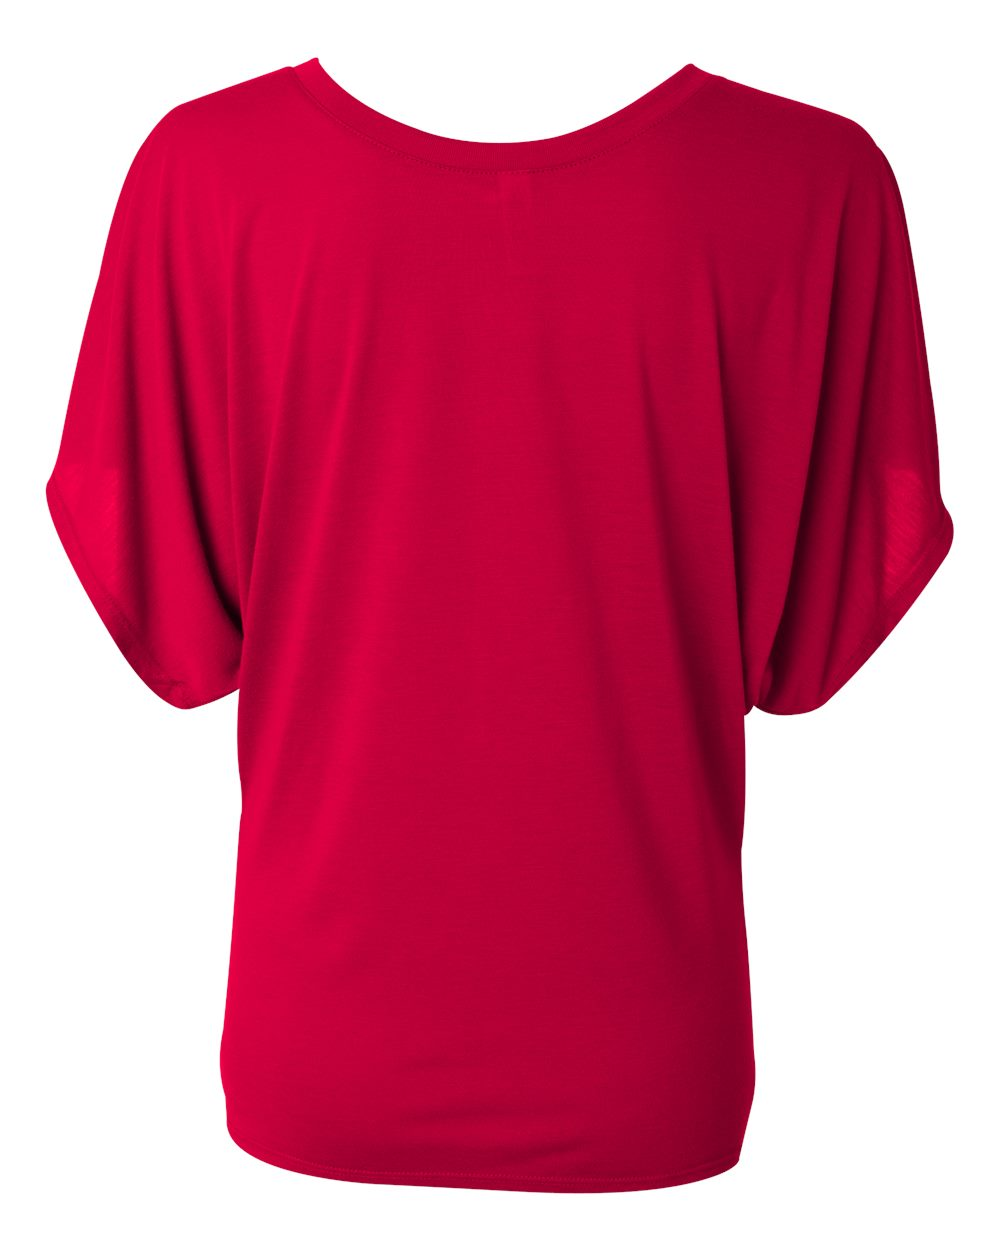 Bella-Canvas-Women-039-s-Flowy-Draped-Sleeve-Dolman-T-Shirt-8821-S-2XL thumbnail 34